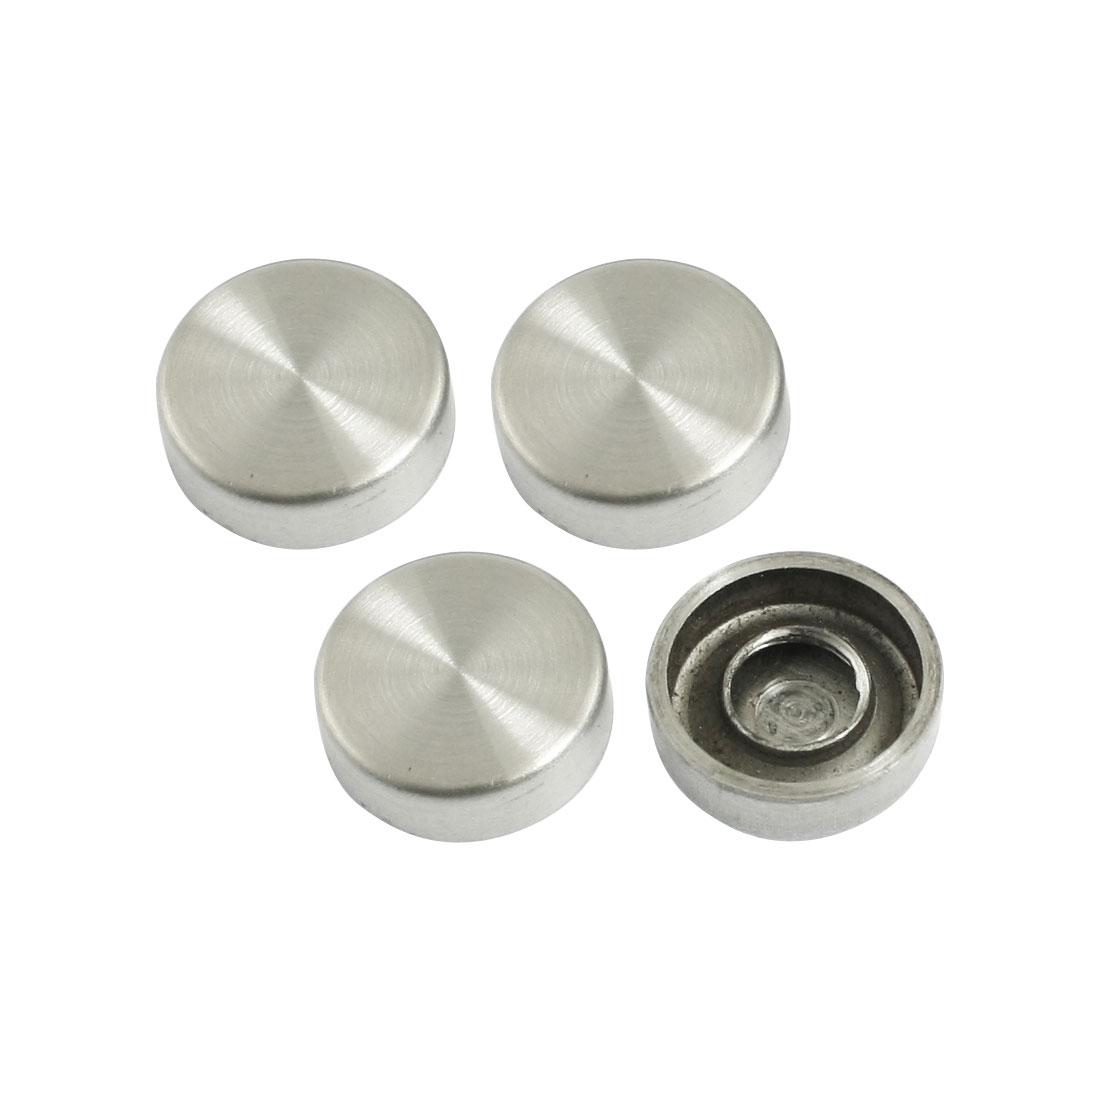 Wardrobes-Mirror-16mm-Diameter-Silver-Tone-Round-Cap-Screw-Nails-4-Pcs